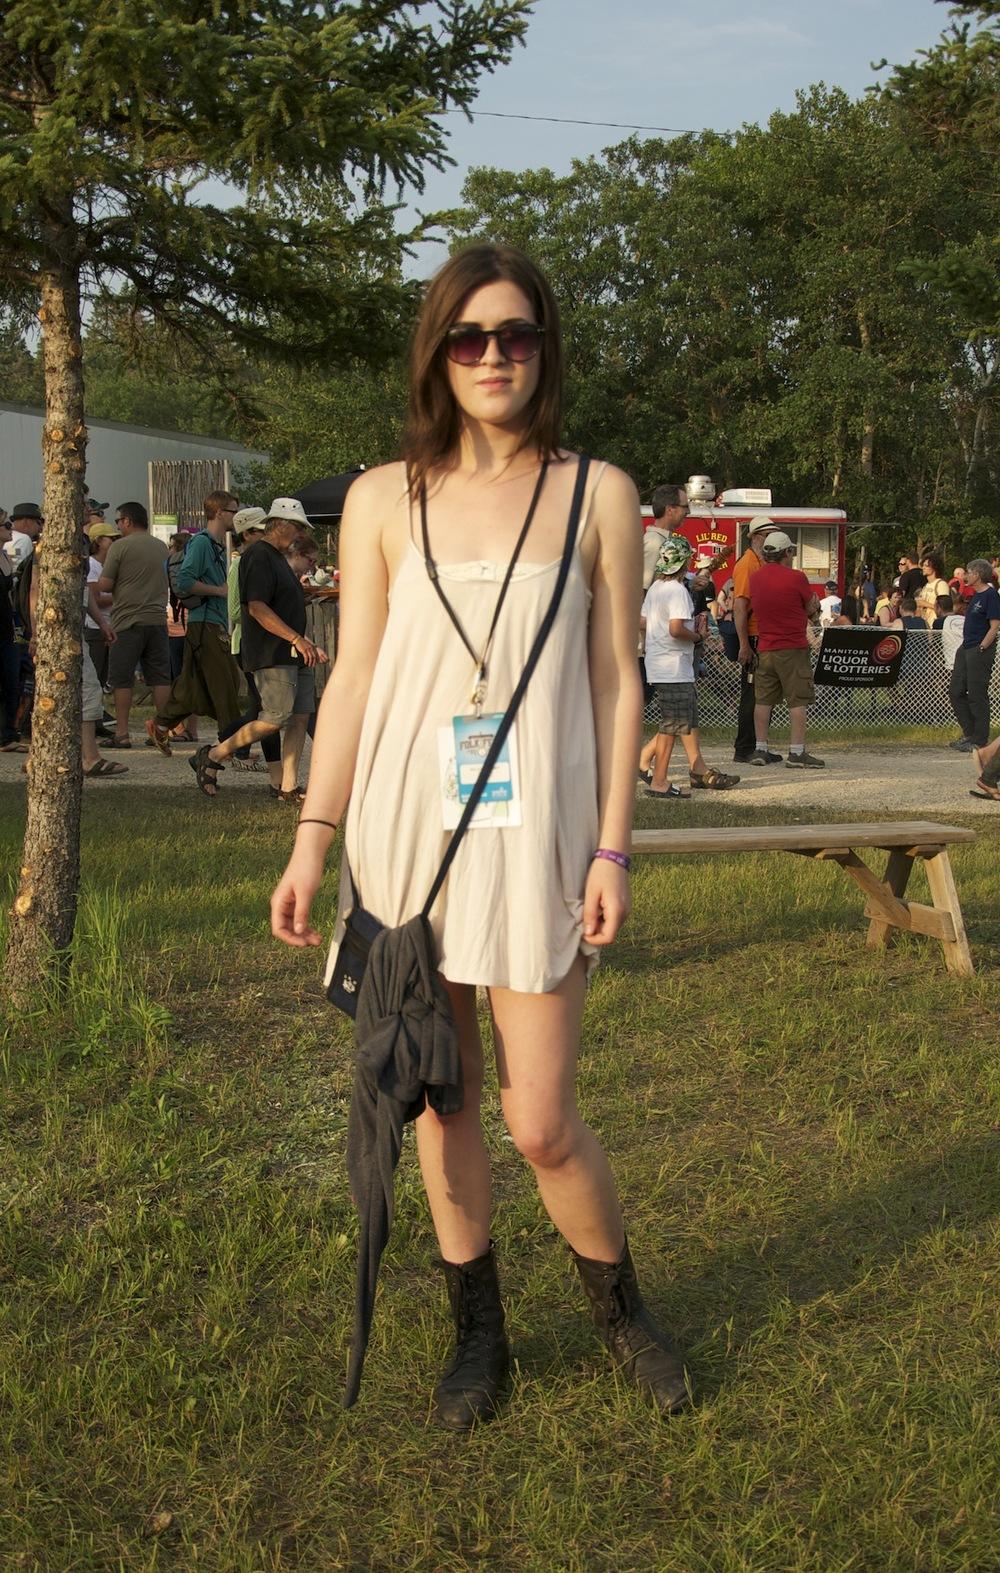 LWD + army boots = festival ready.